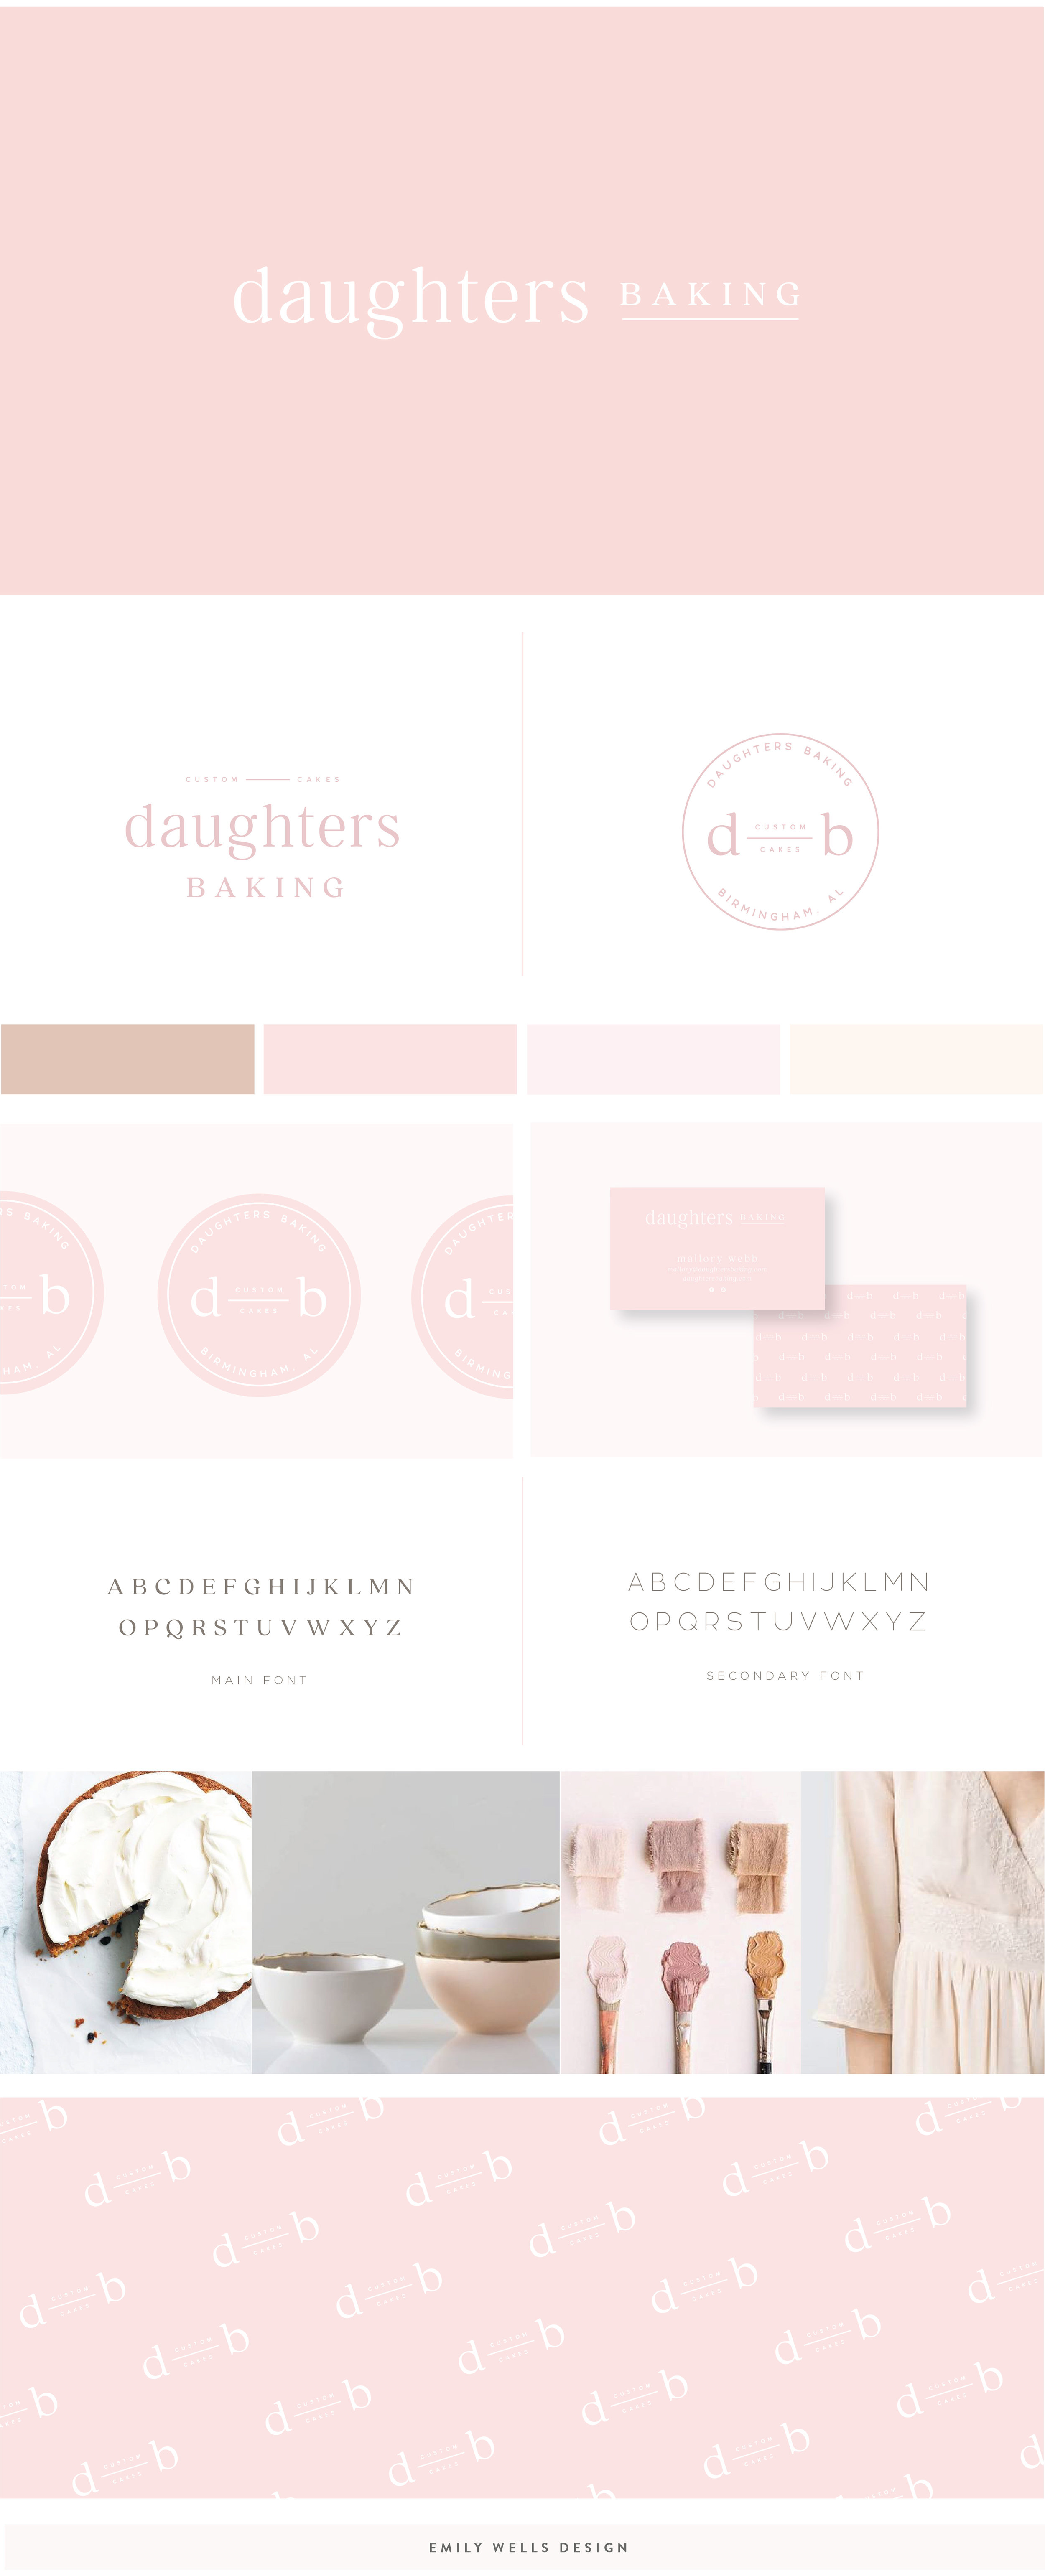 Daughters Baking-01.jpg